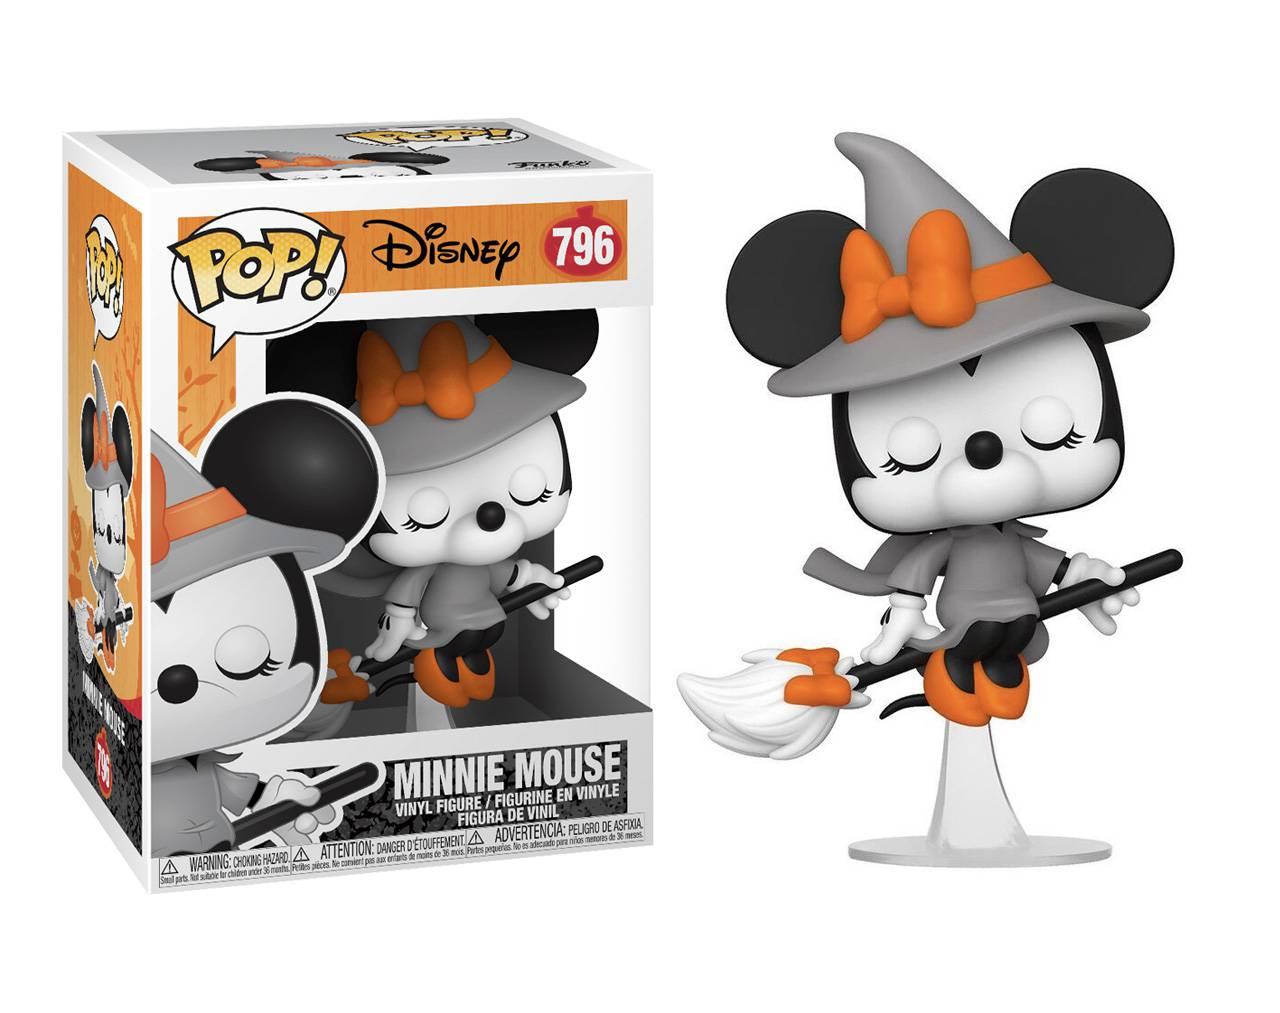 Minnie Mouse (Halloween) Pop! Vinyl